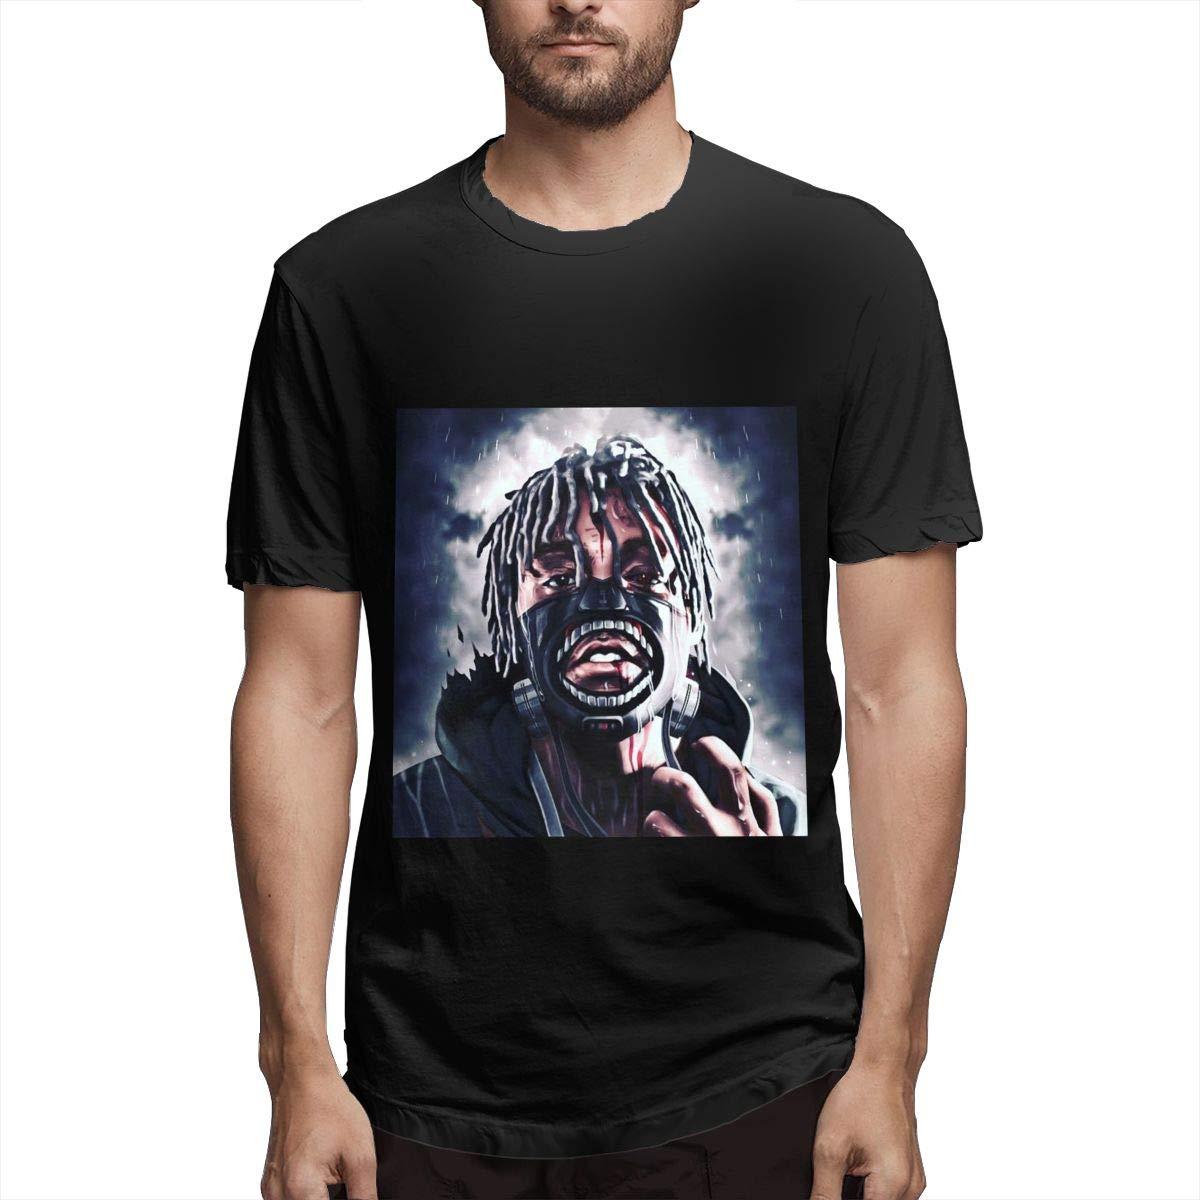 Lihehen S Juice Wrld Retro Printing Round Neck Ts Shirts